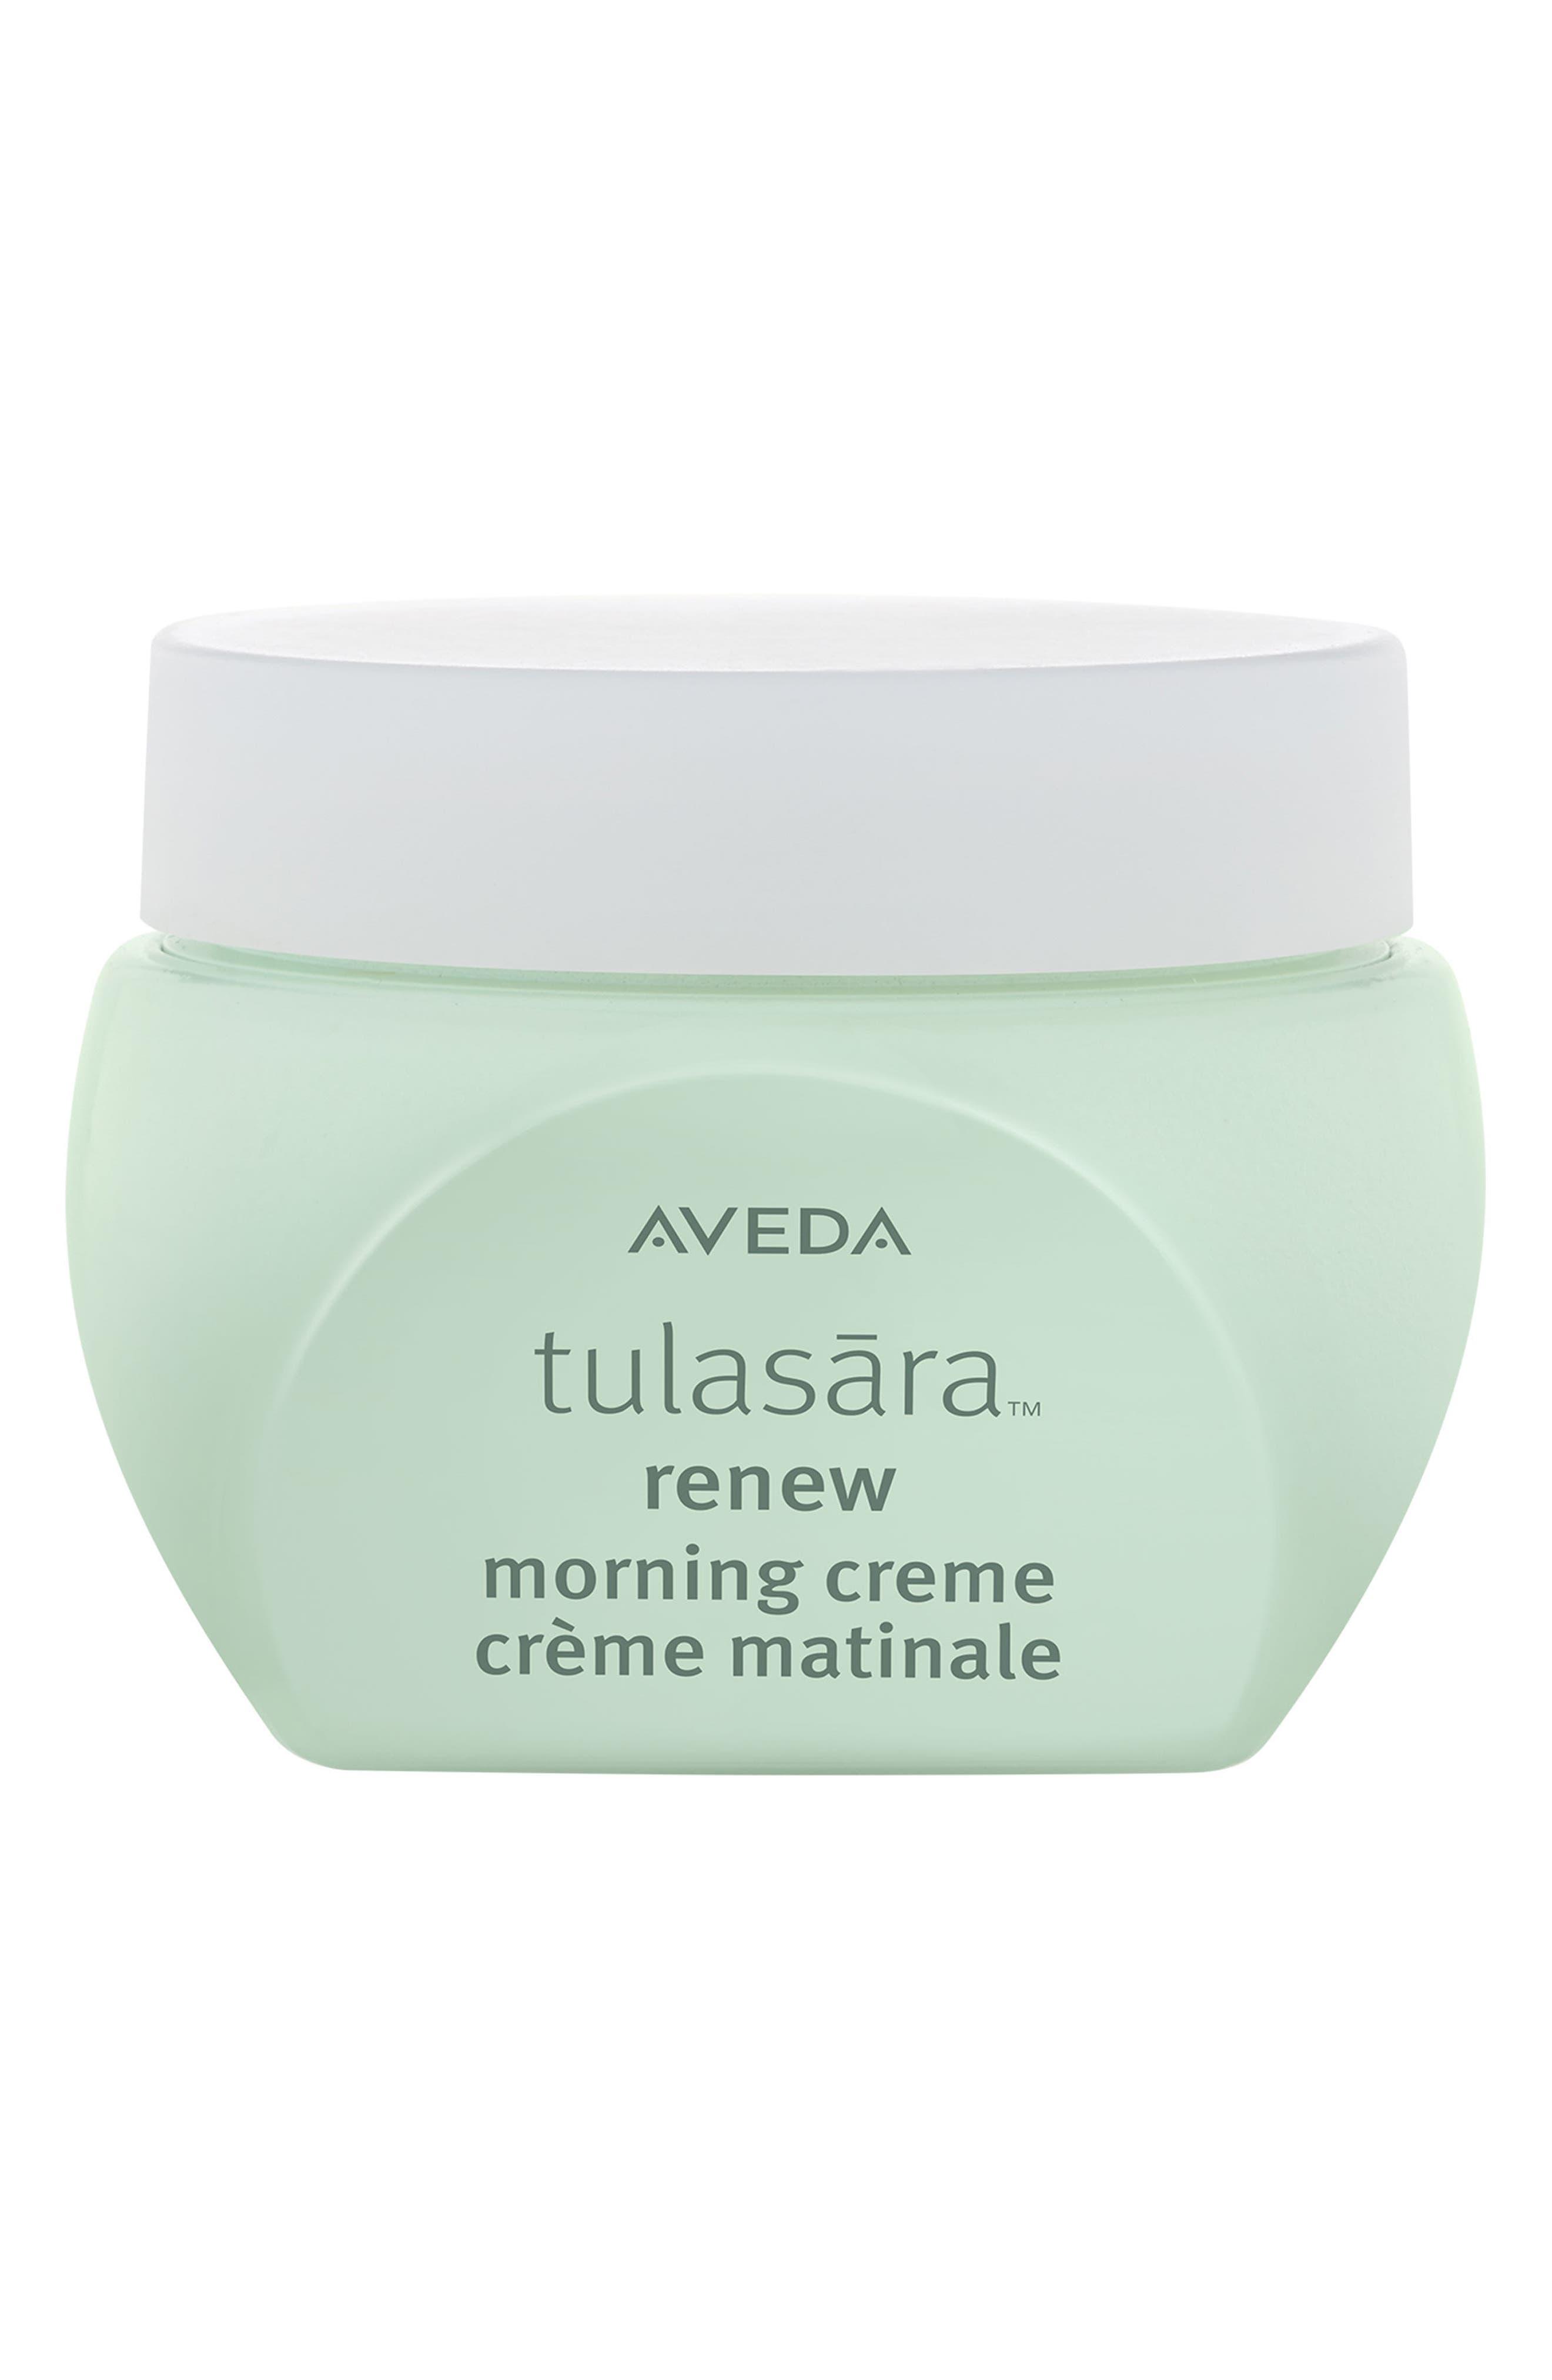 Main Image - Aveda tulasara™ renew Morning Crème